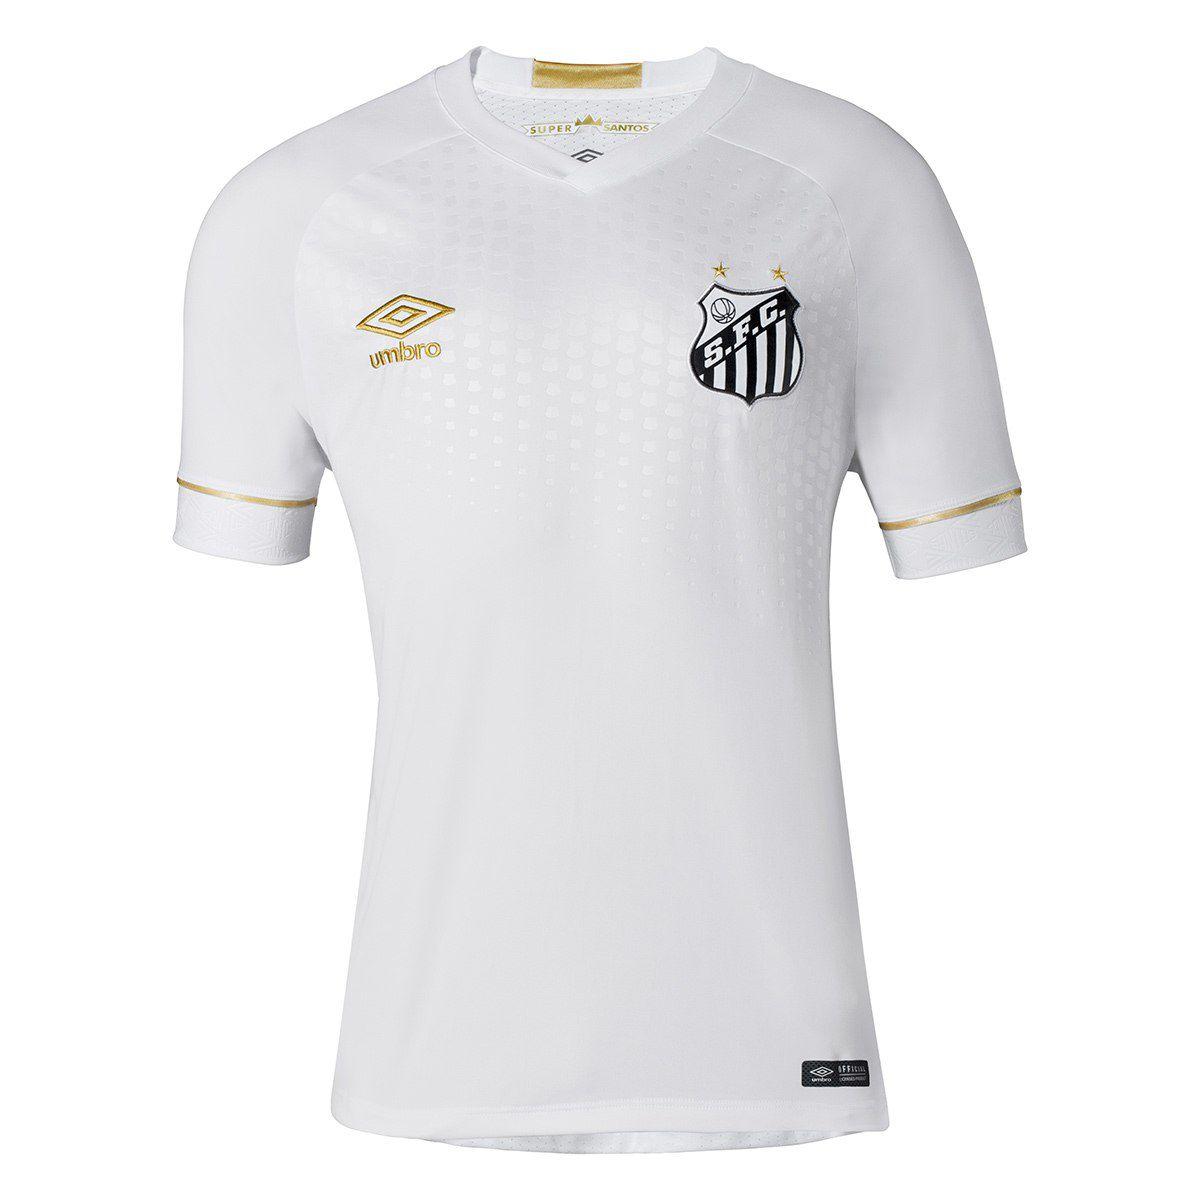 Camisa Masculino Umbro Santos Of.1 2018